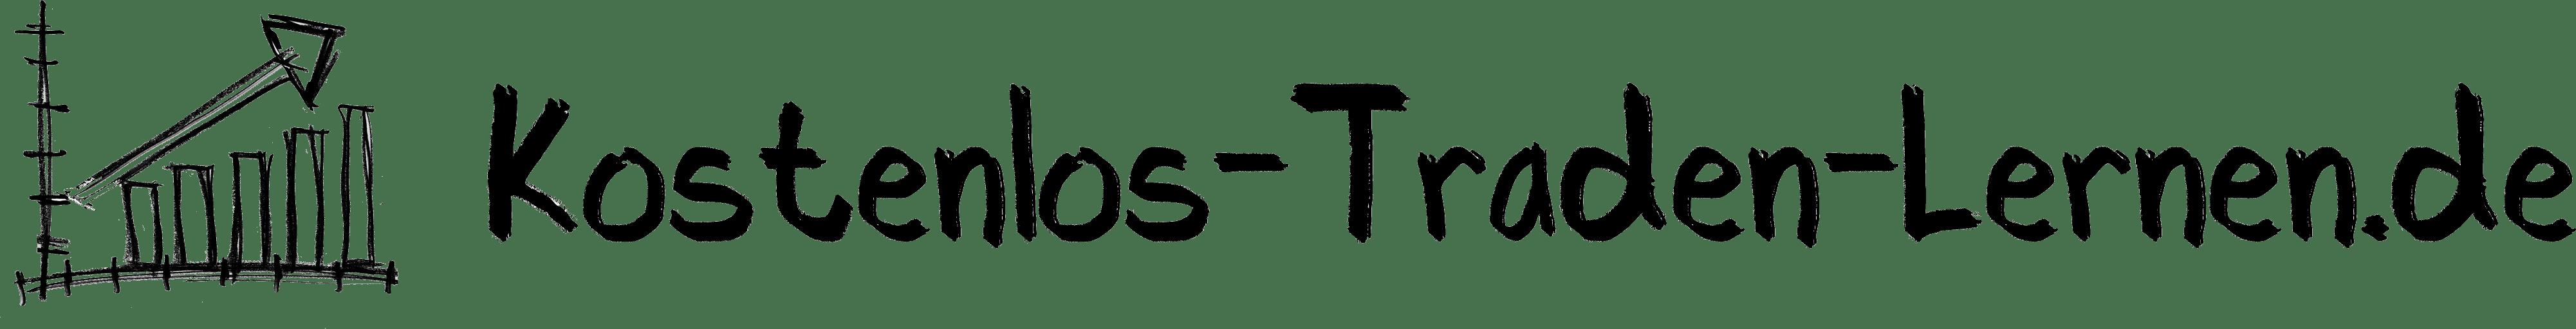 Kostenlos Traden lernen Logo